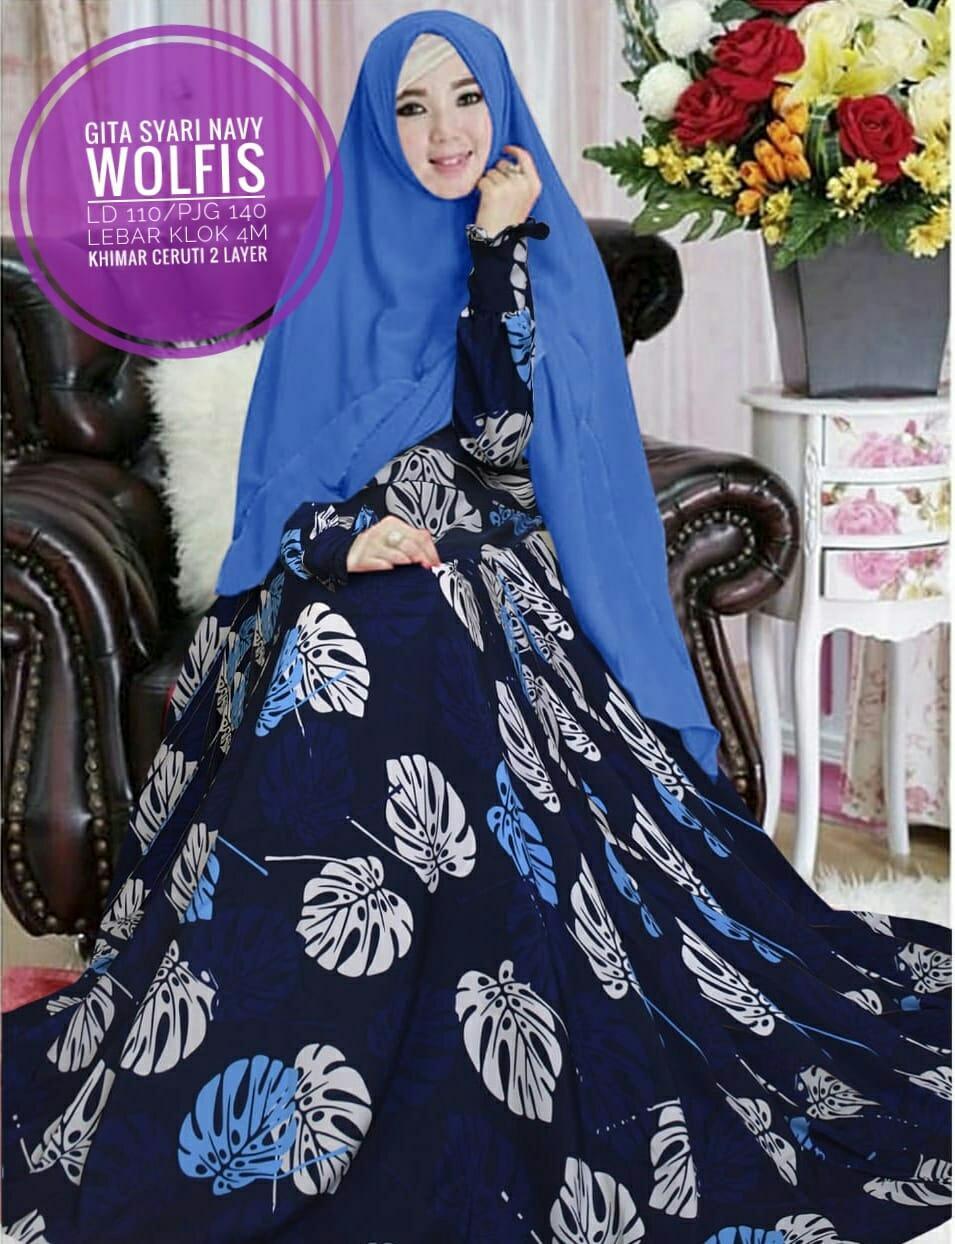 Harga Jual Promo Hijab Jilbab Khimar Syari Jumbo Kinari 3 Layer 3layer Ori Grosir Hasanah Gamis Gisya 2in1 Set Arlita Fashion Baju